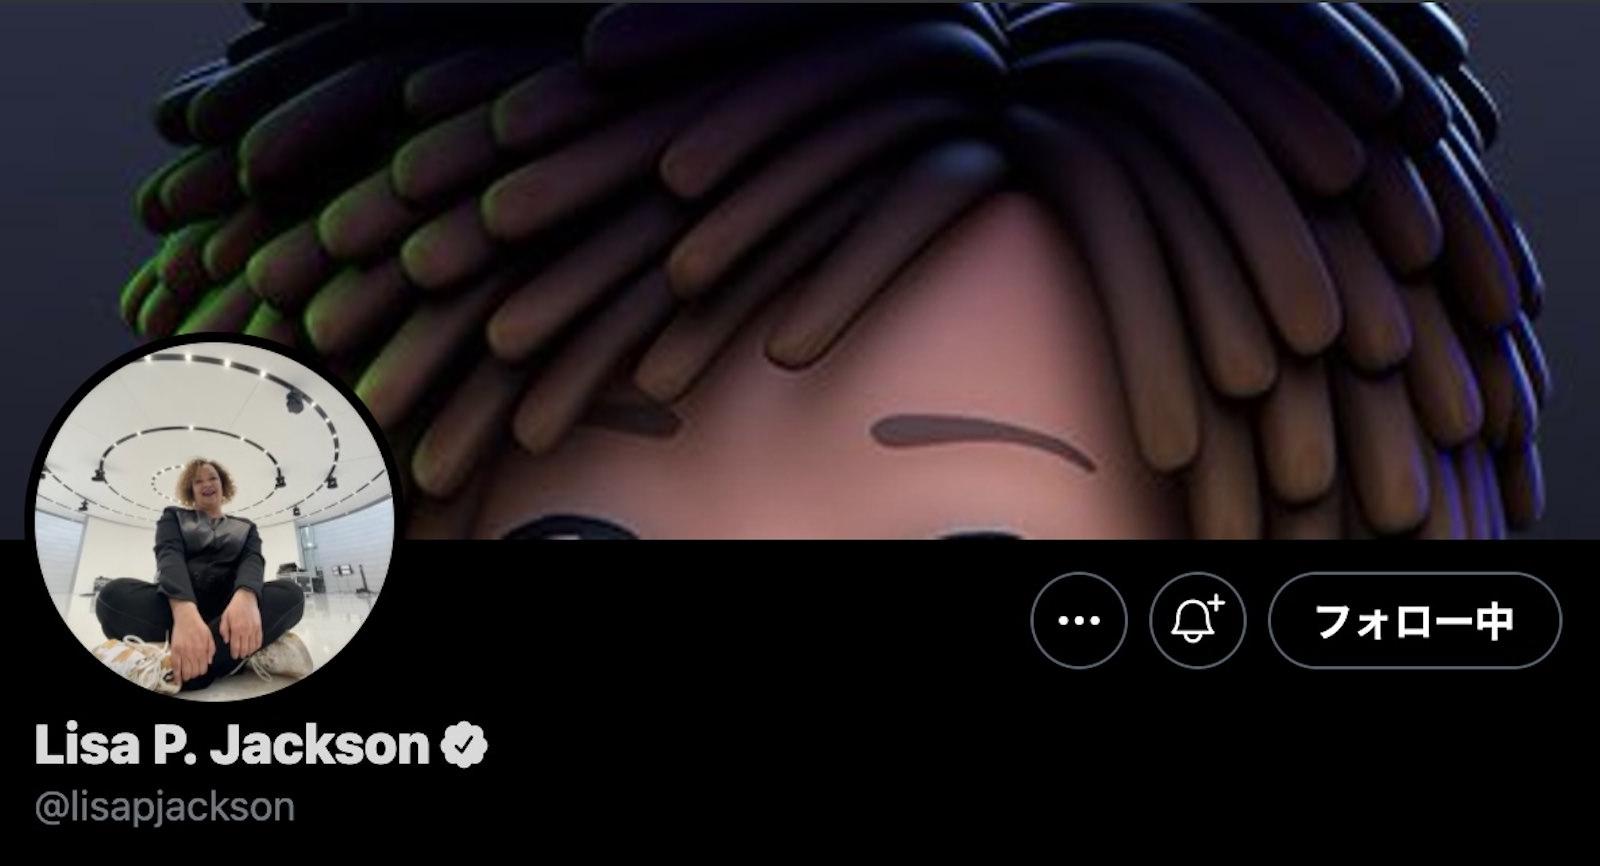 Lisa jackson profile image